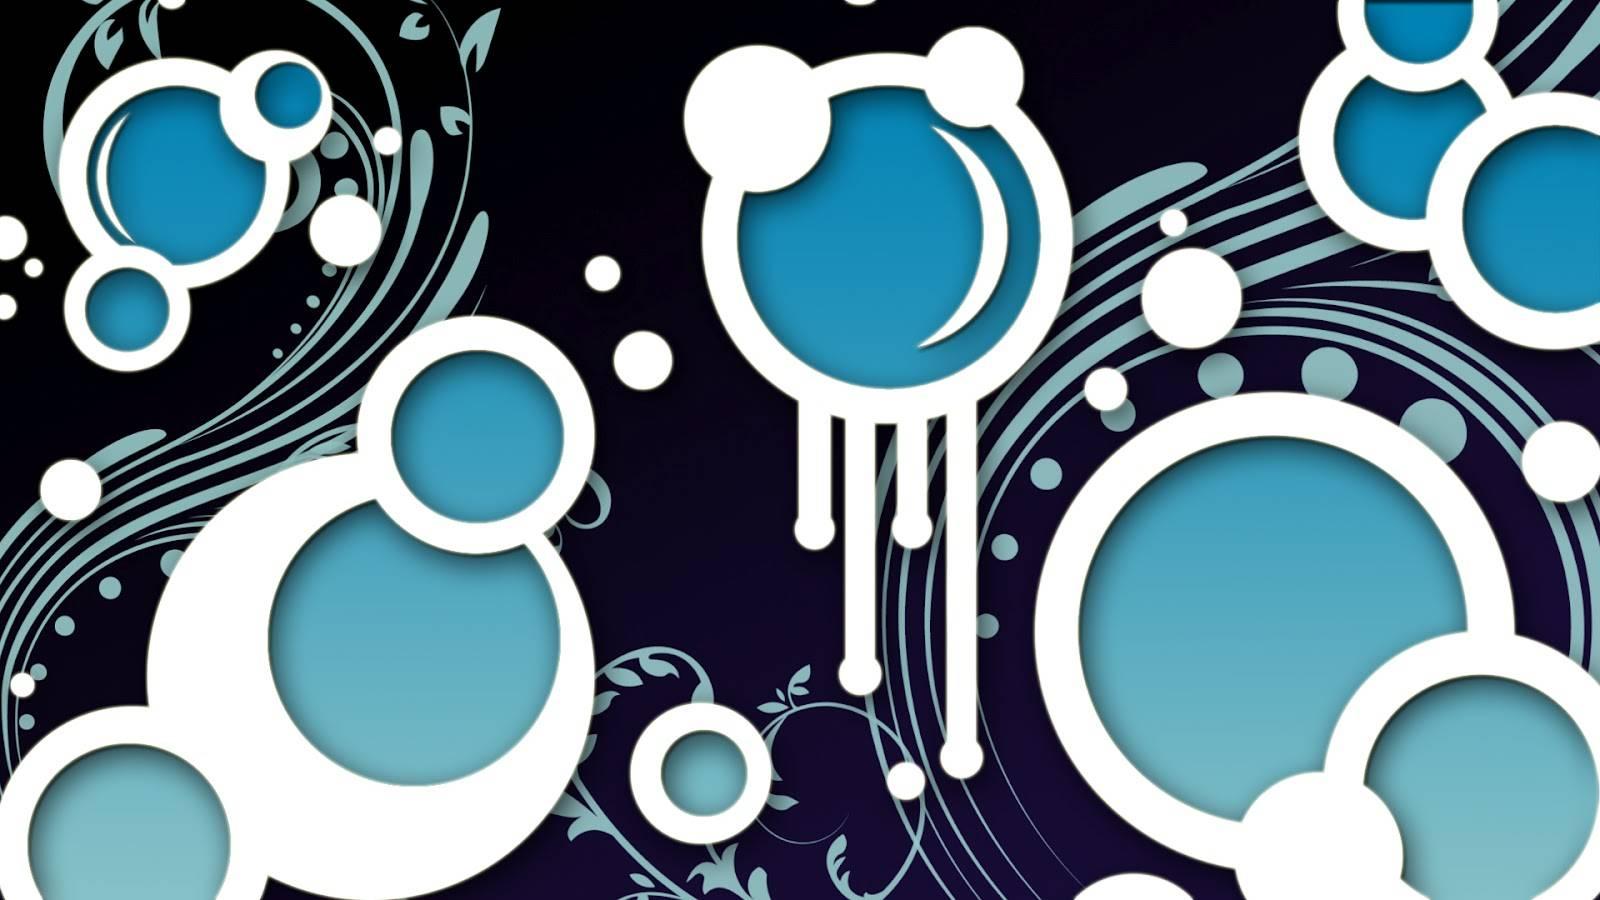 Desktop animated wallpapers mac os x lion download 1600x900